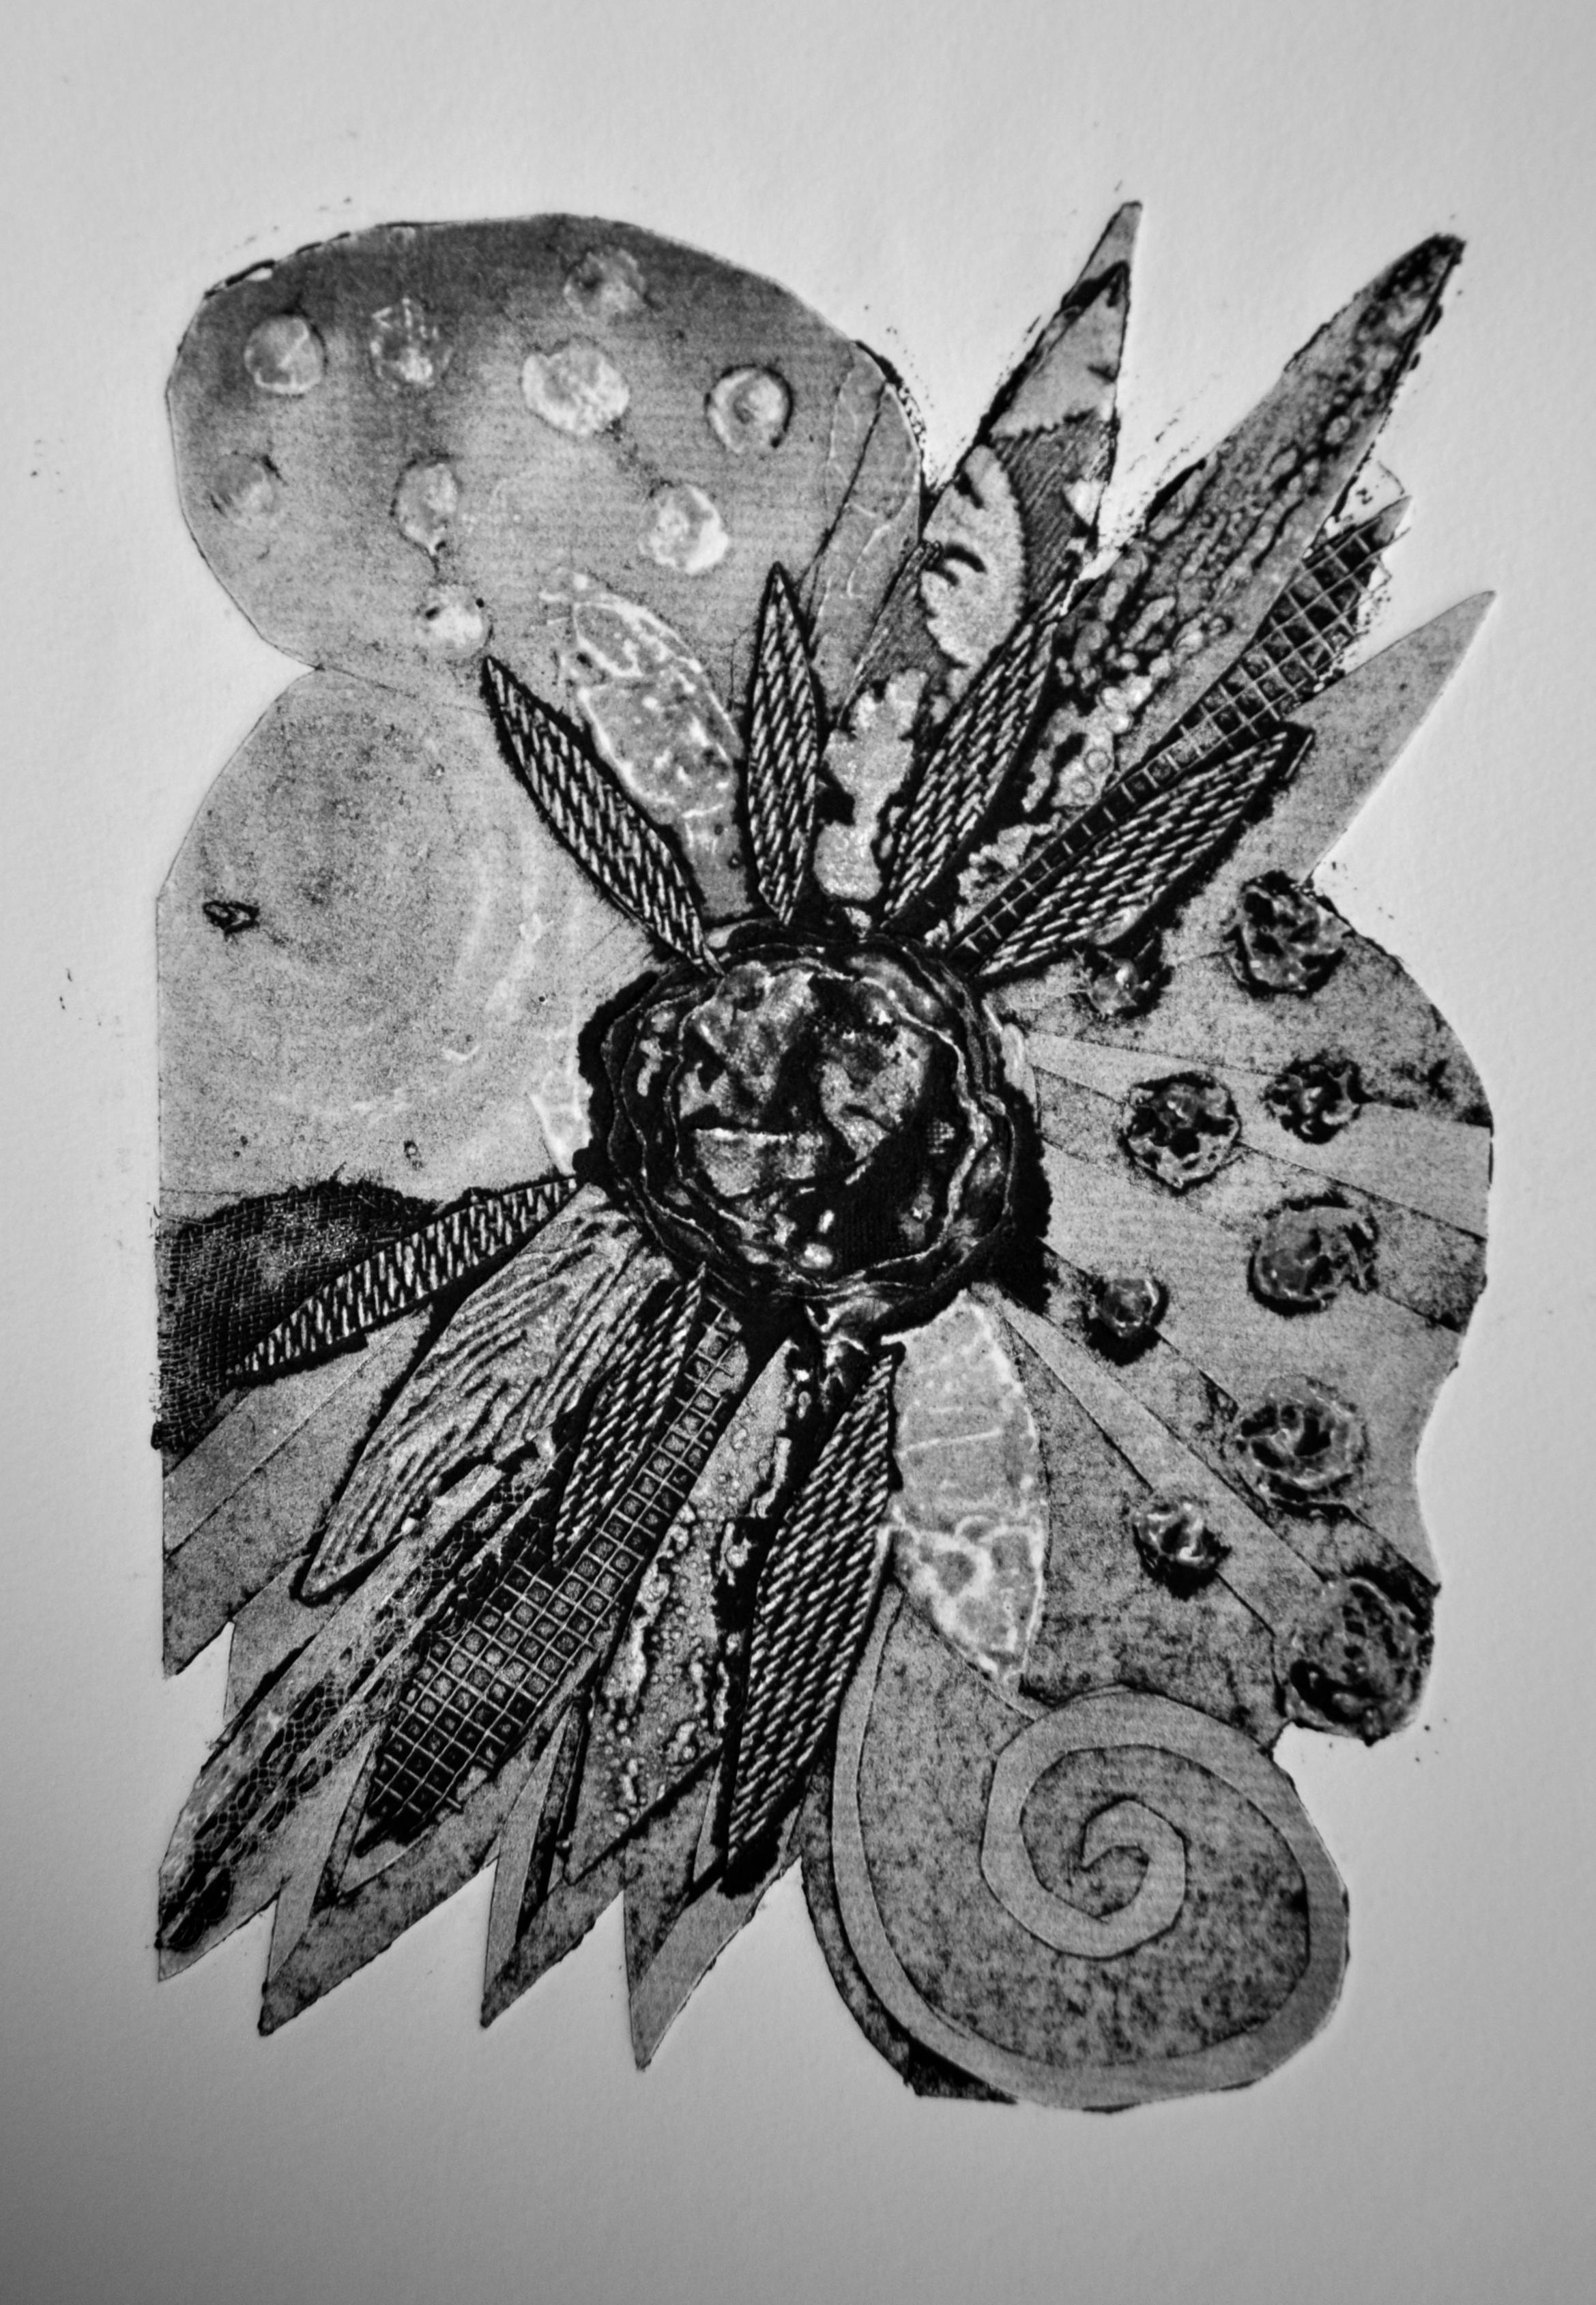 Floral Textures, 2014